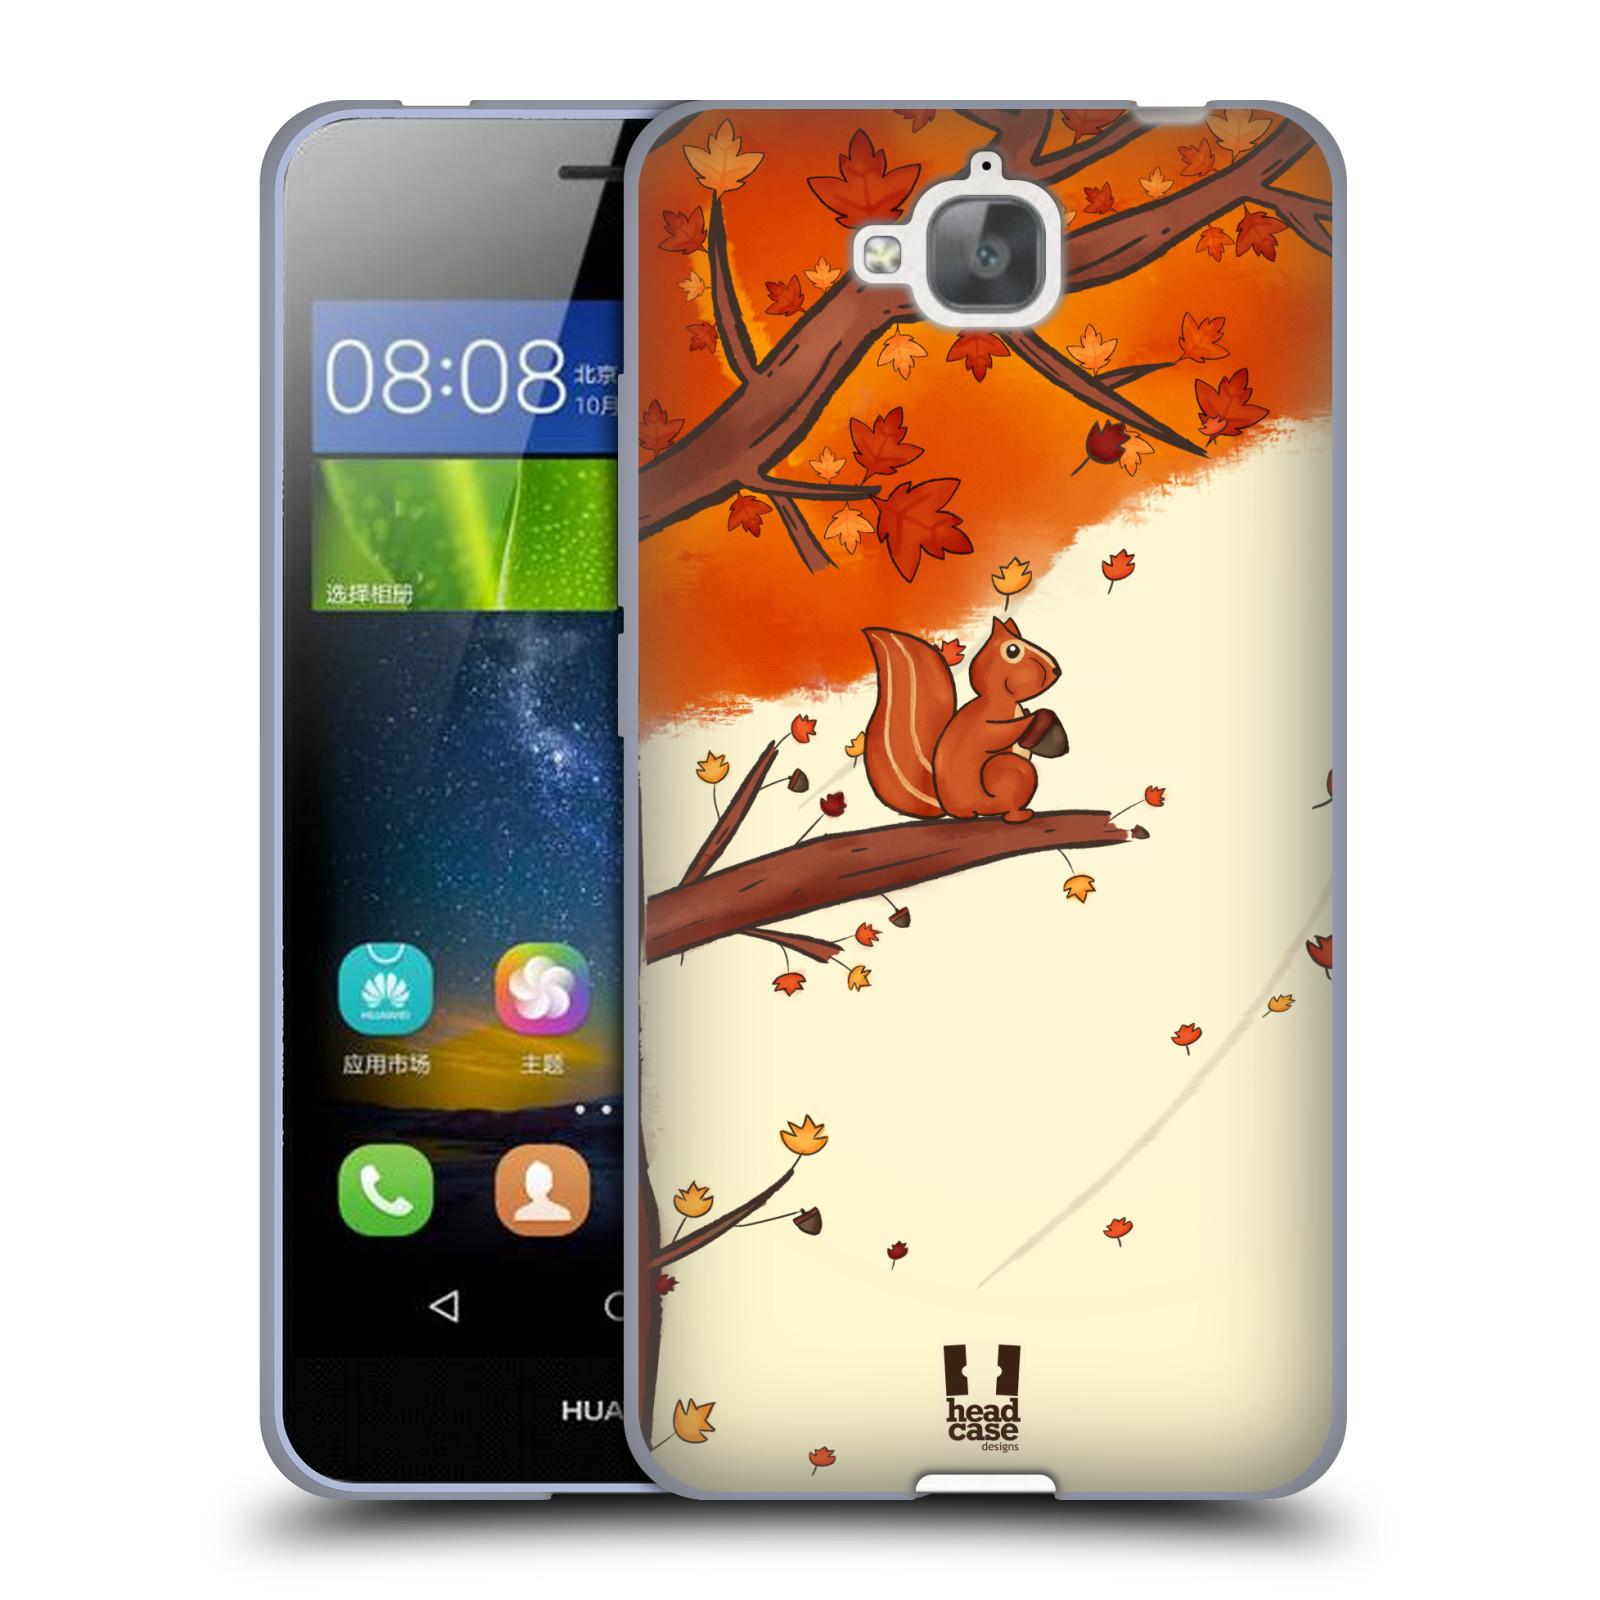 Silikonové pouzdro na mobil Huawei Y6 Pro Dual Sim HEAD CASE PODZIMNÍ VEVERKA